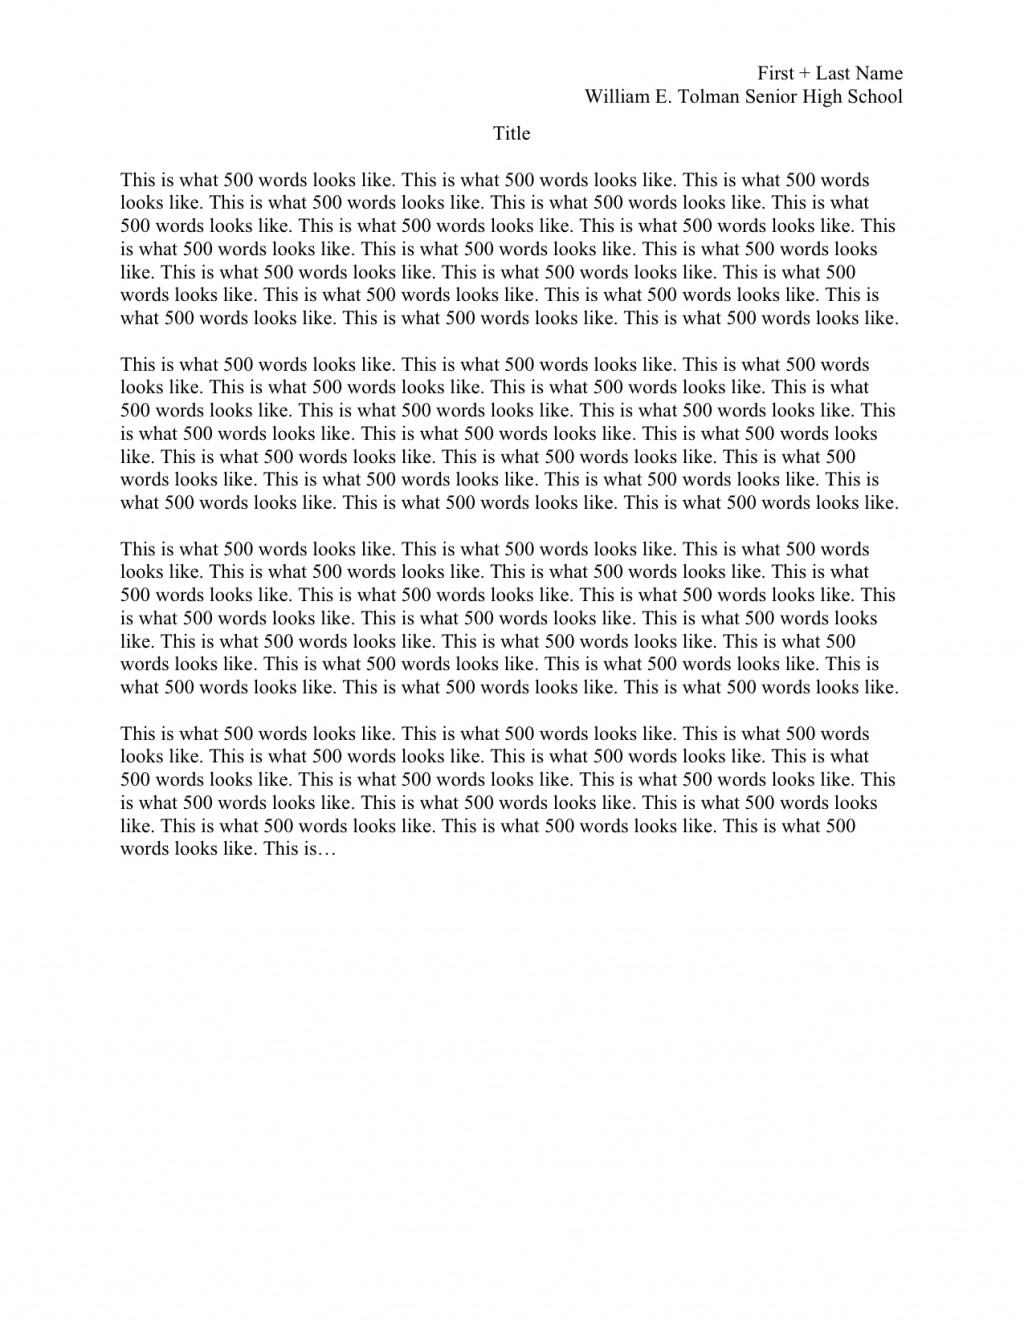 012 Essay Example Write Essays For Money College Best University High School Reddit Large